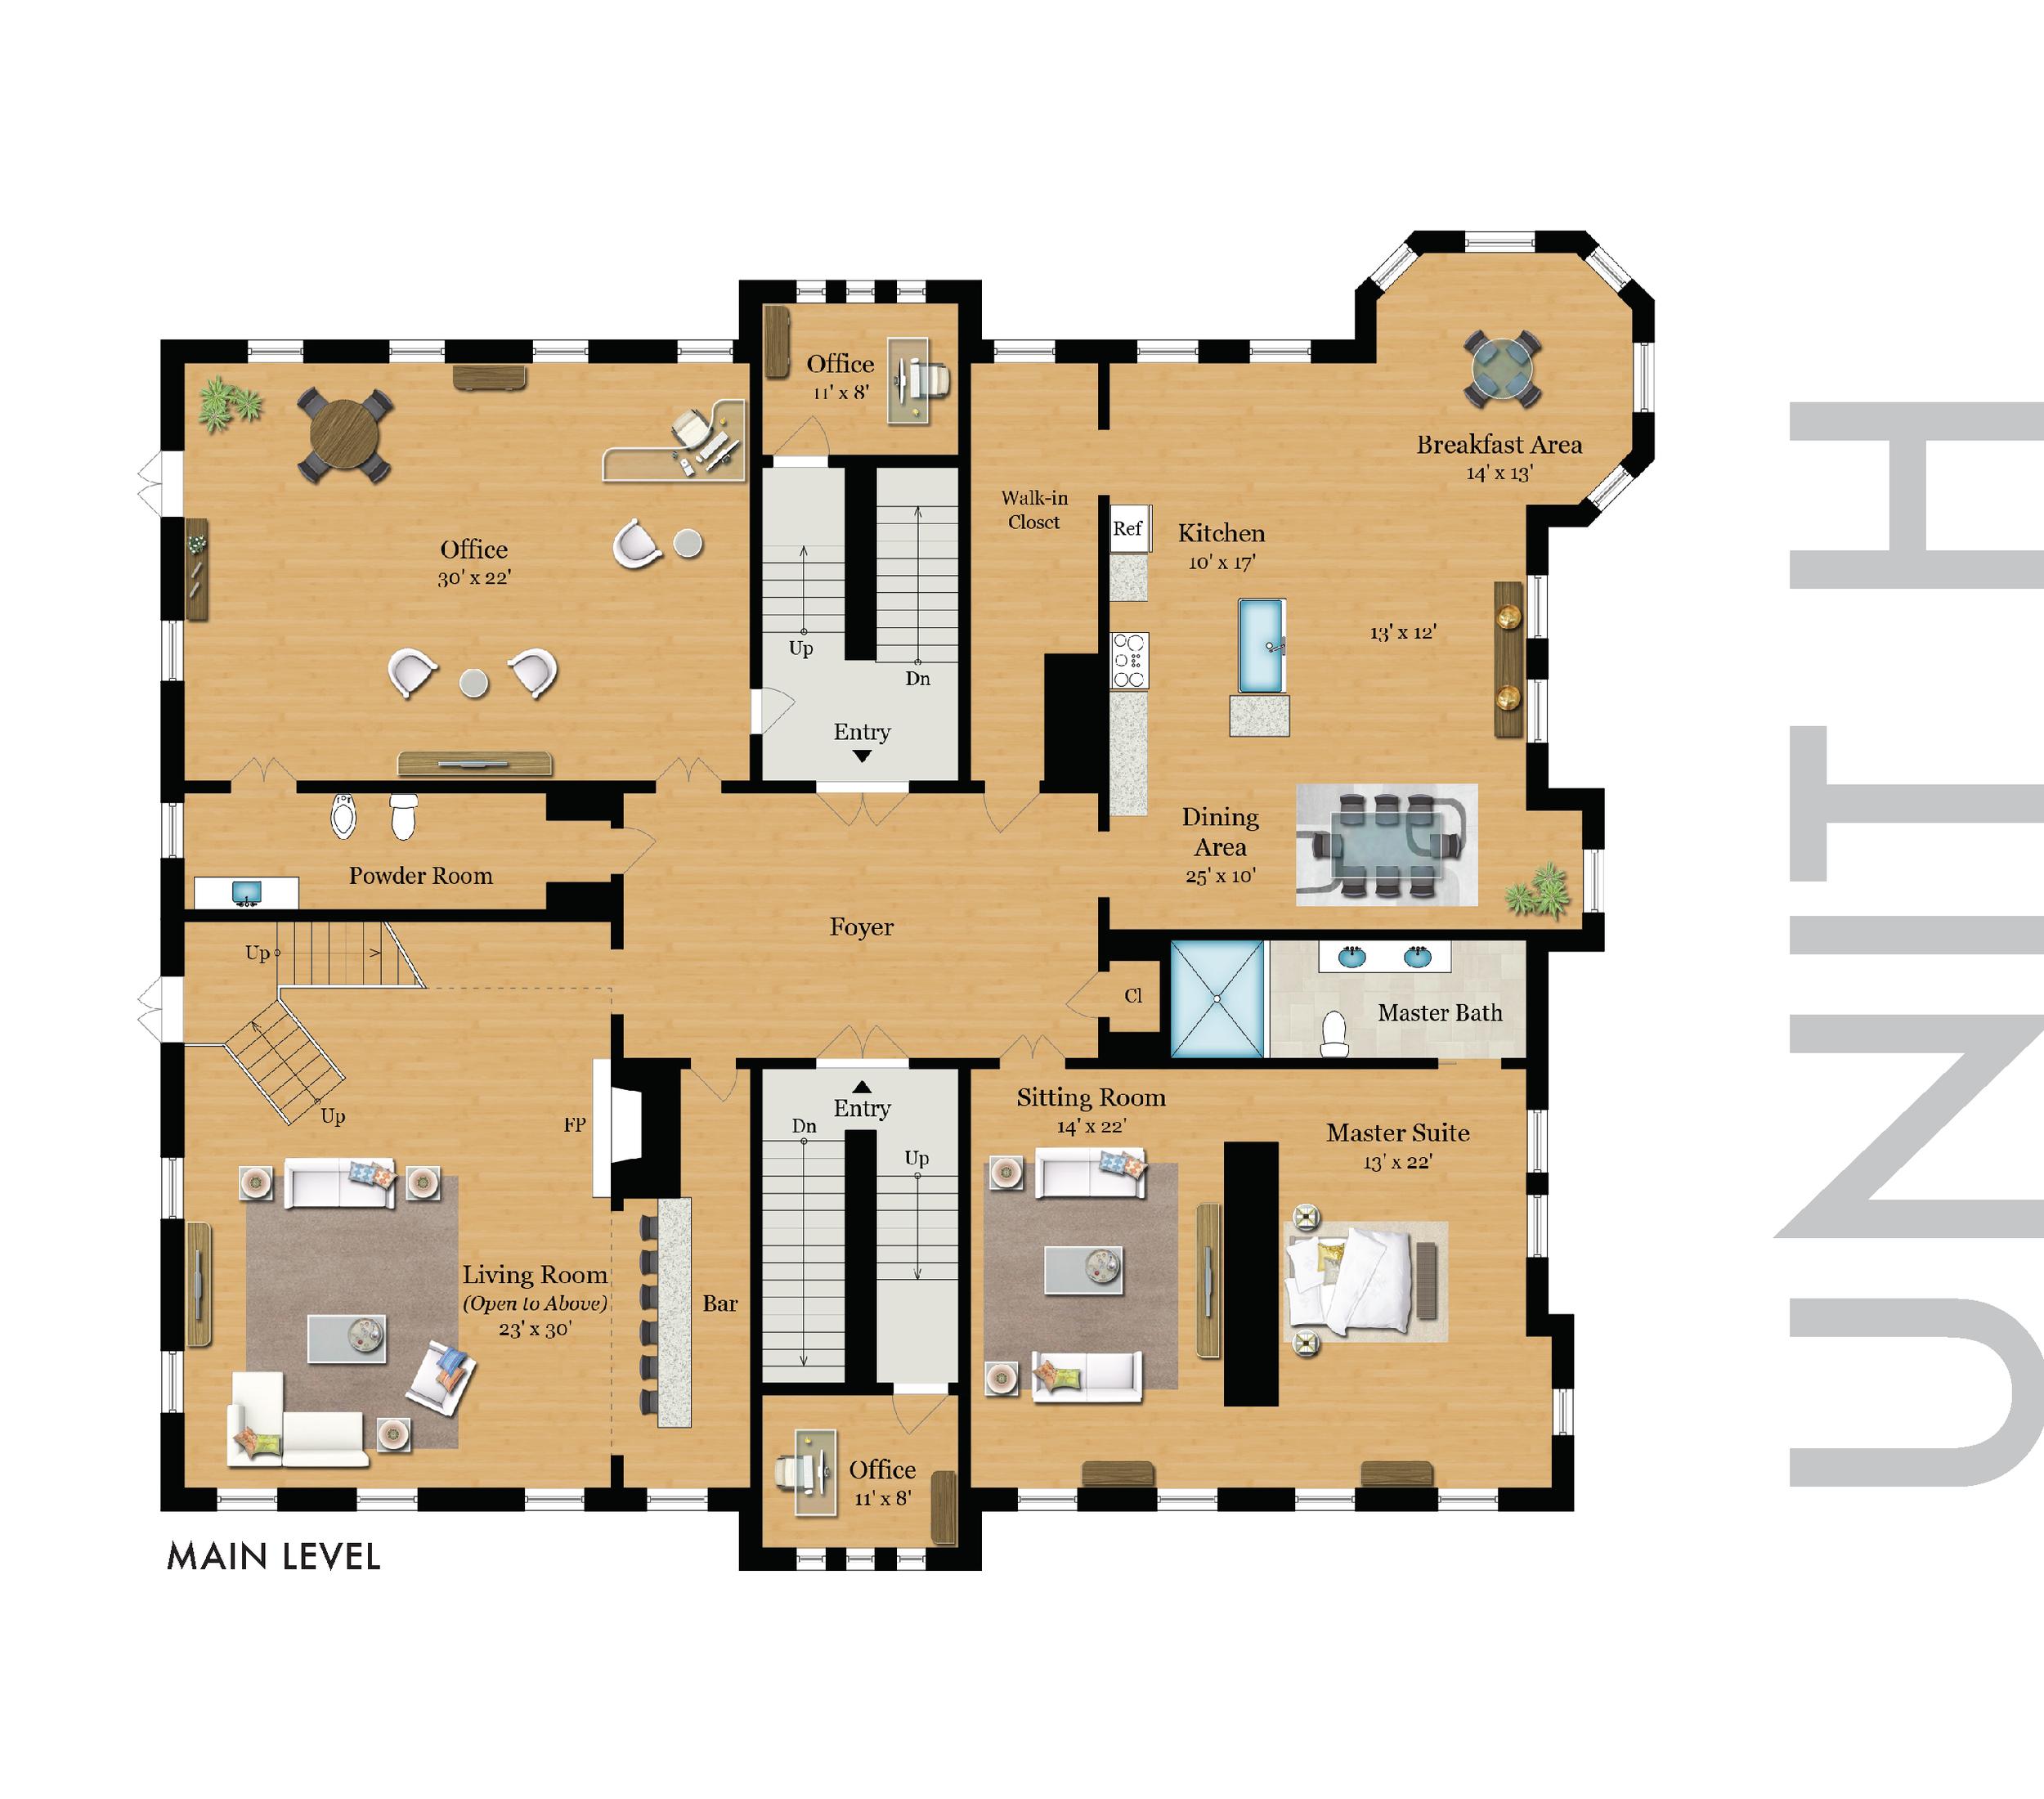 PierceSchoolLofts_floorplans_PNG_H.png